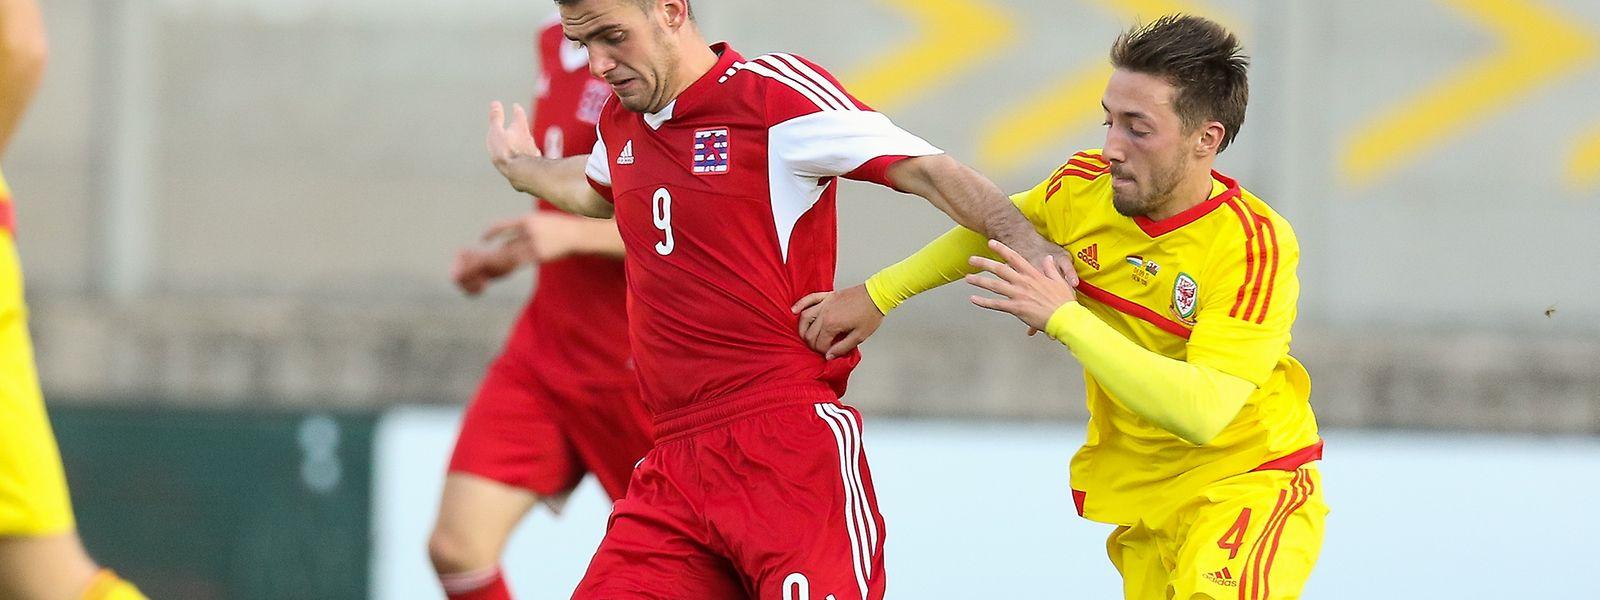 Luxemburgs U21-Nationalspieler Jeff Lascak (9) im Zweikampf mit Joshua Sheehan.